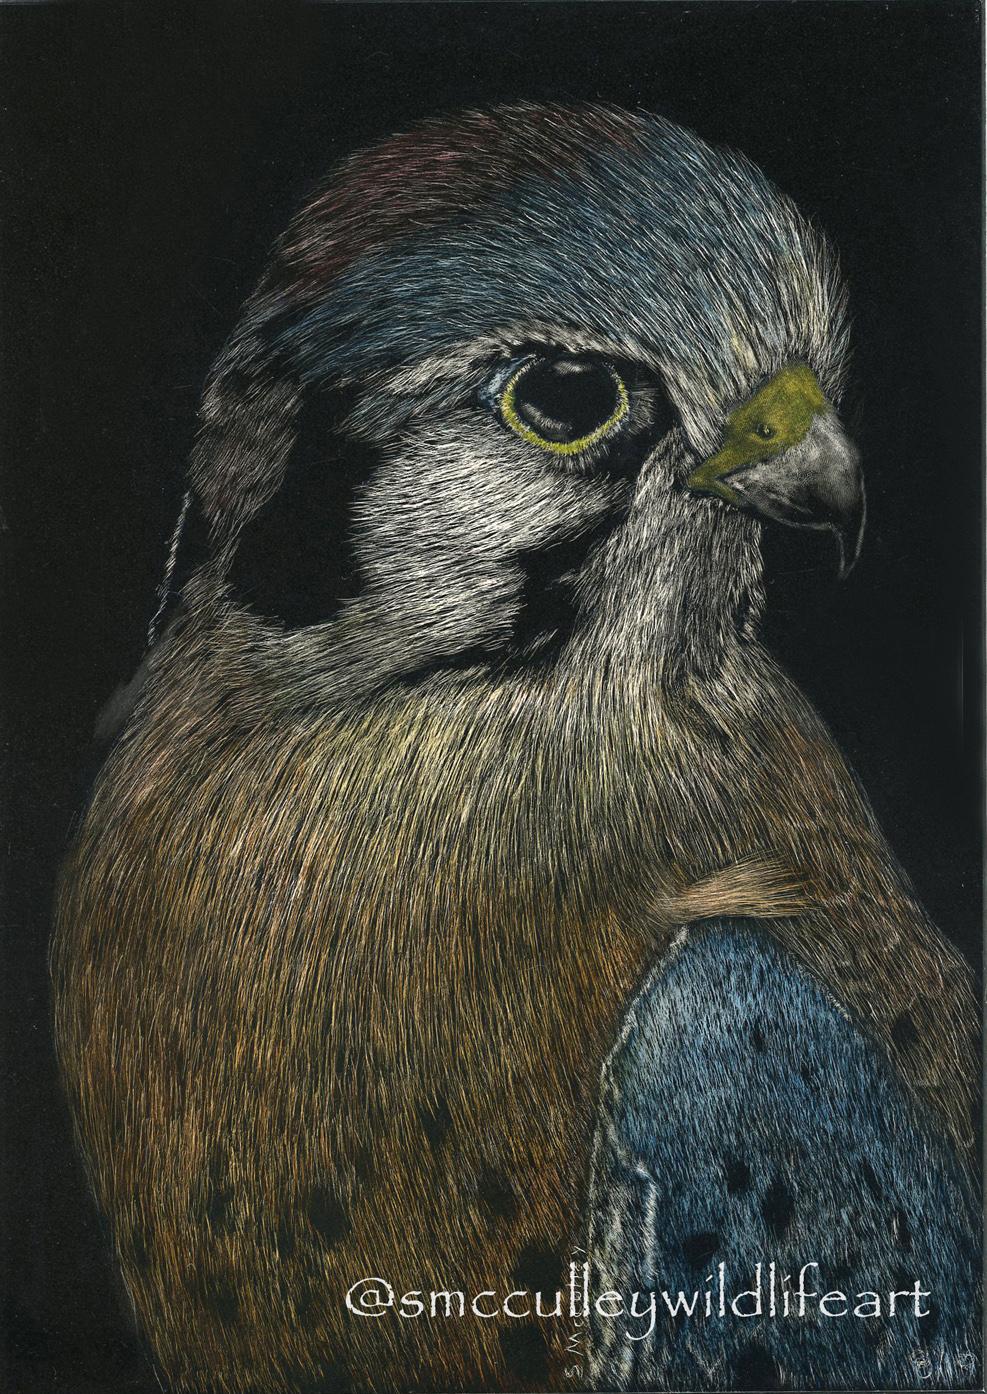 Skye (American Kestrel)